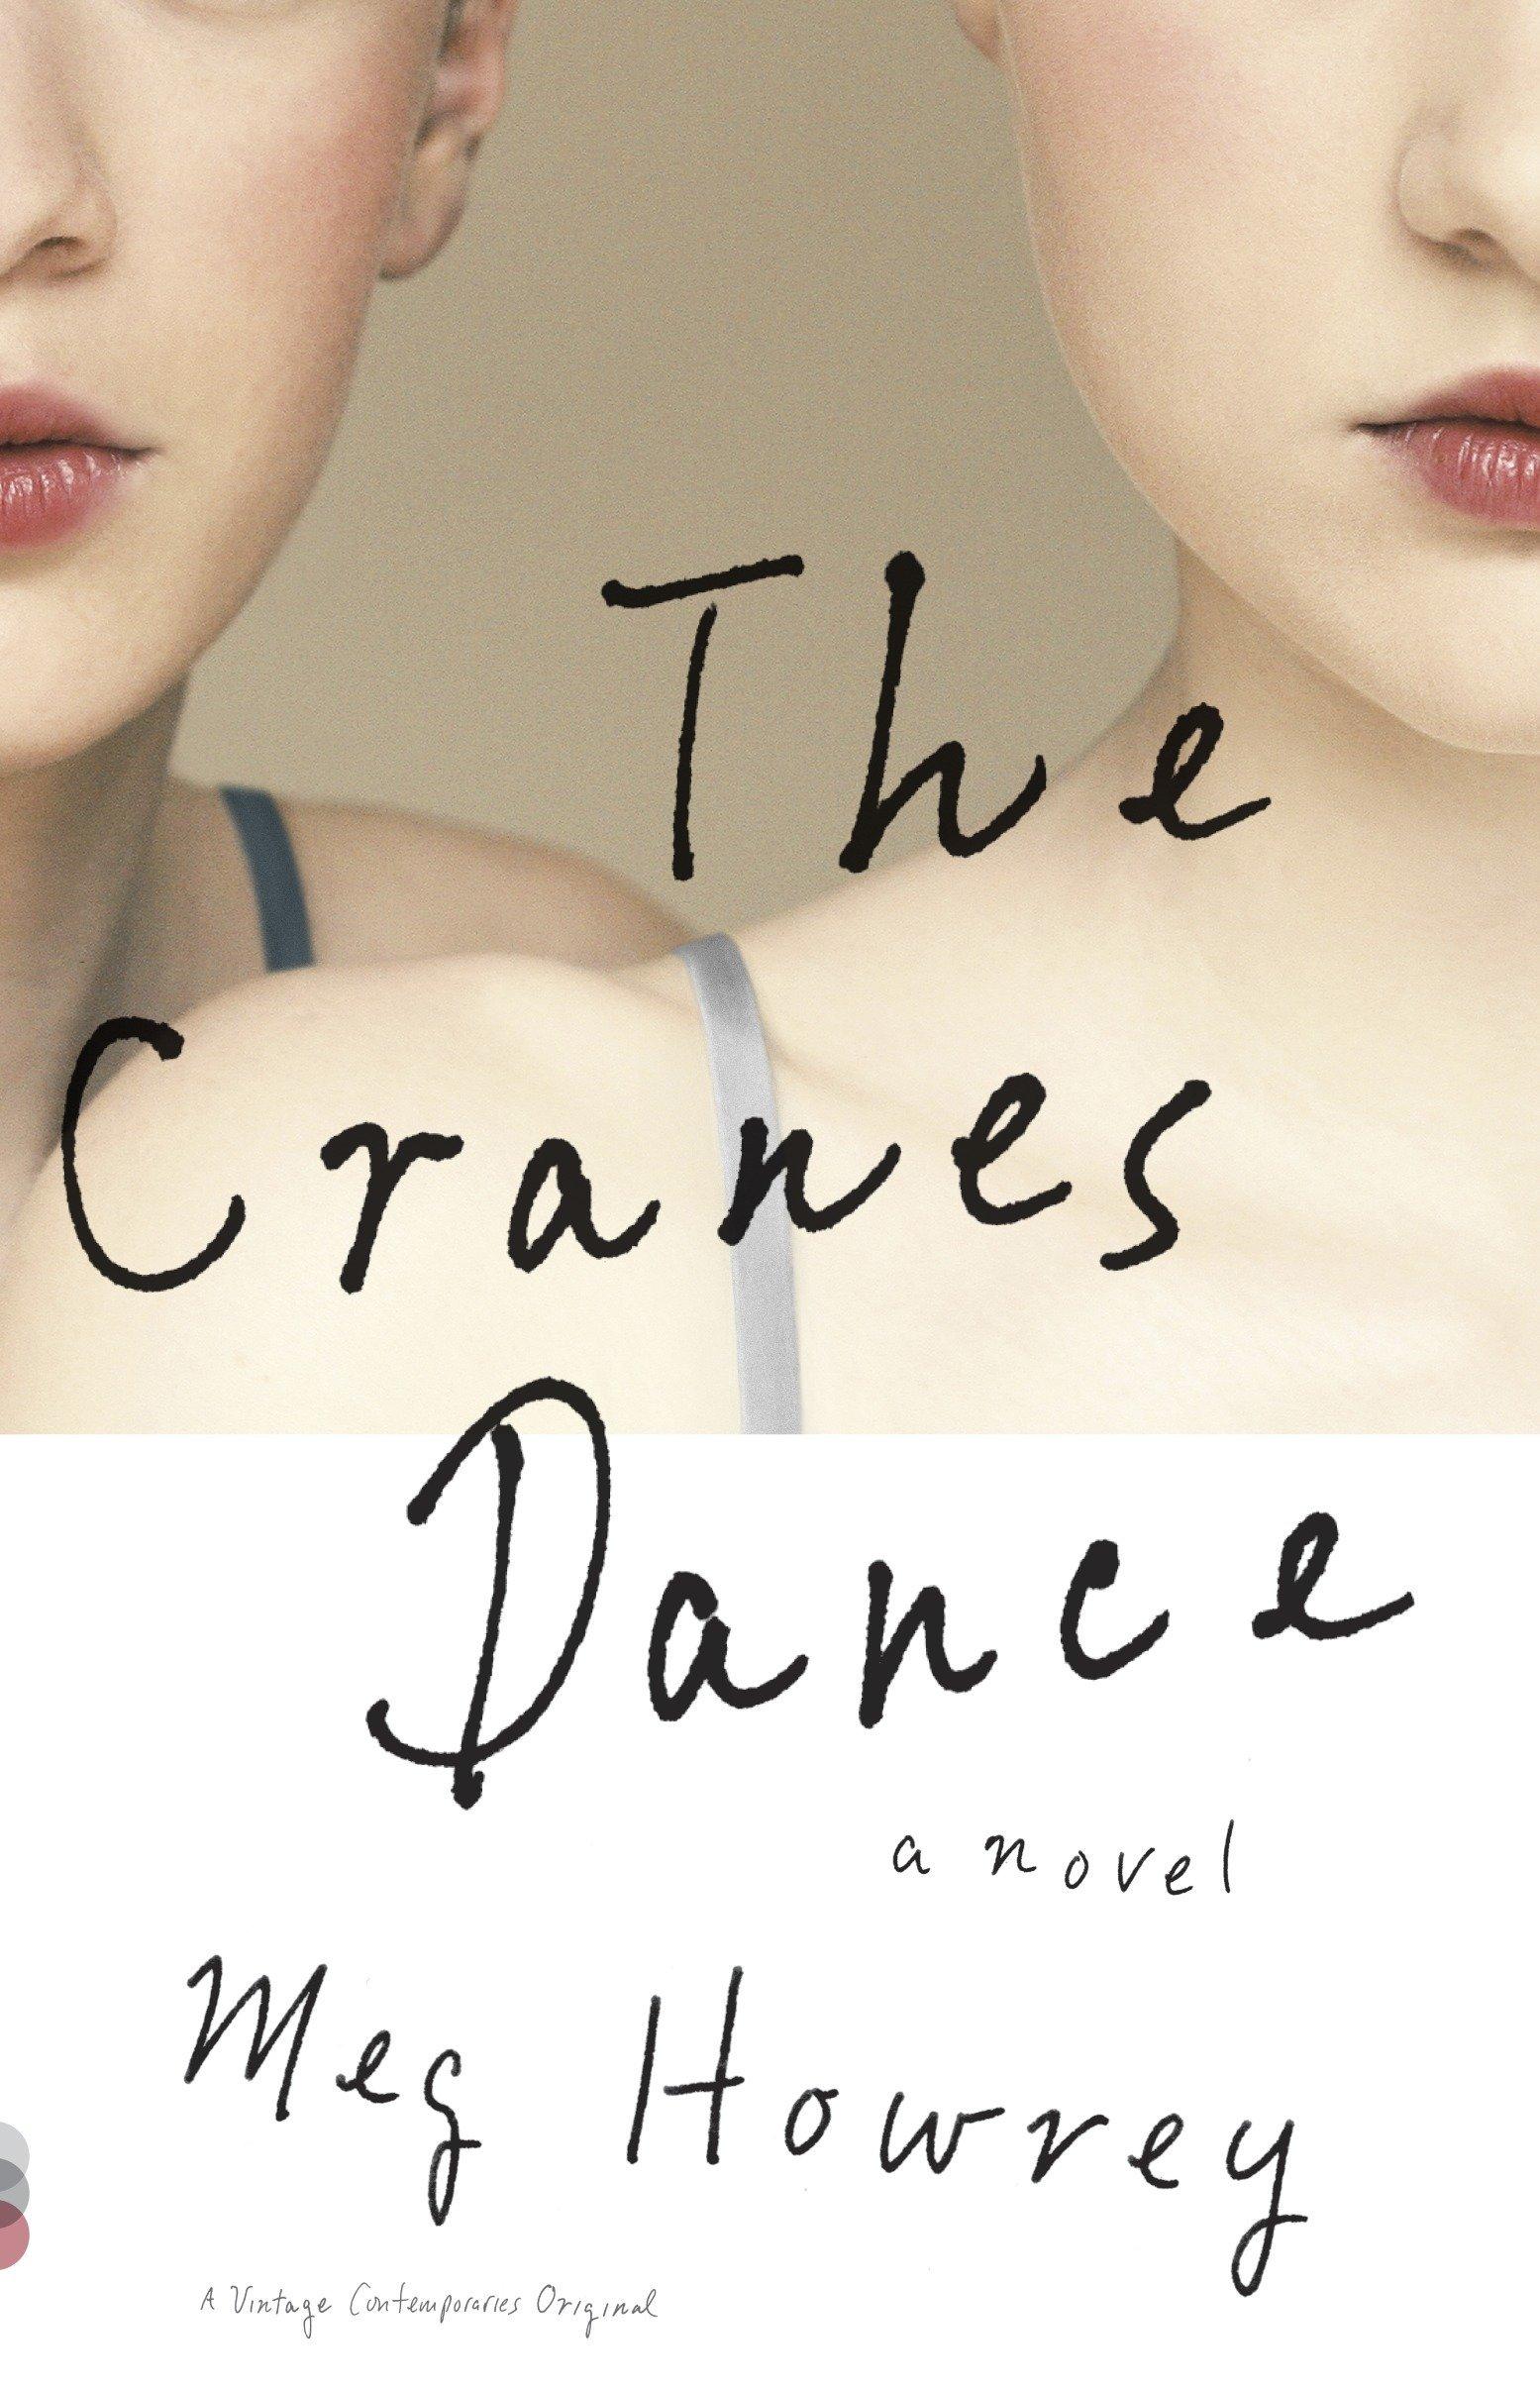 the-cranes-dance-vintage-contemporaries